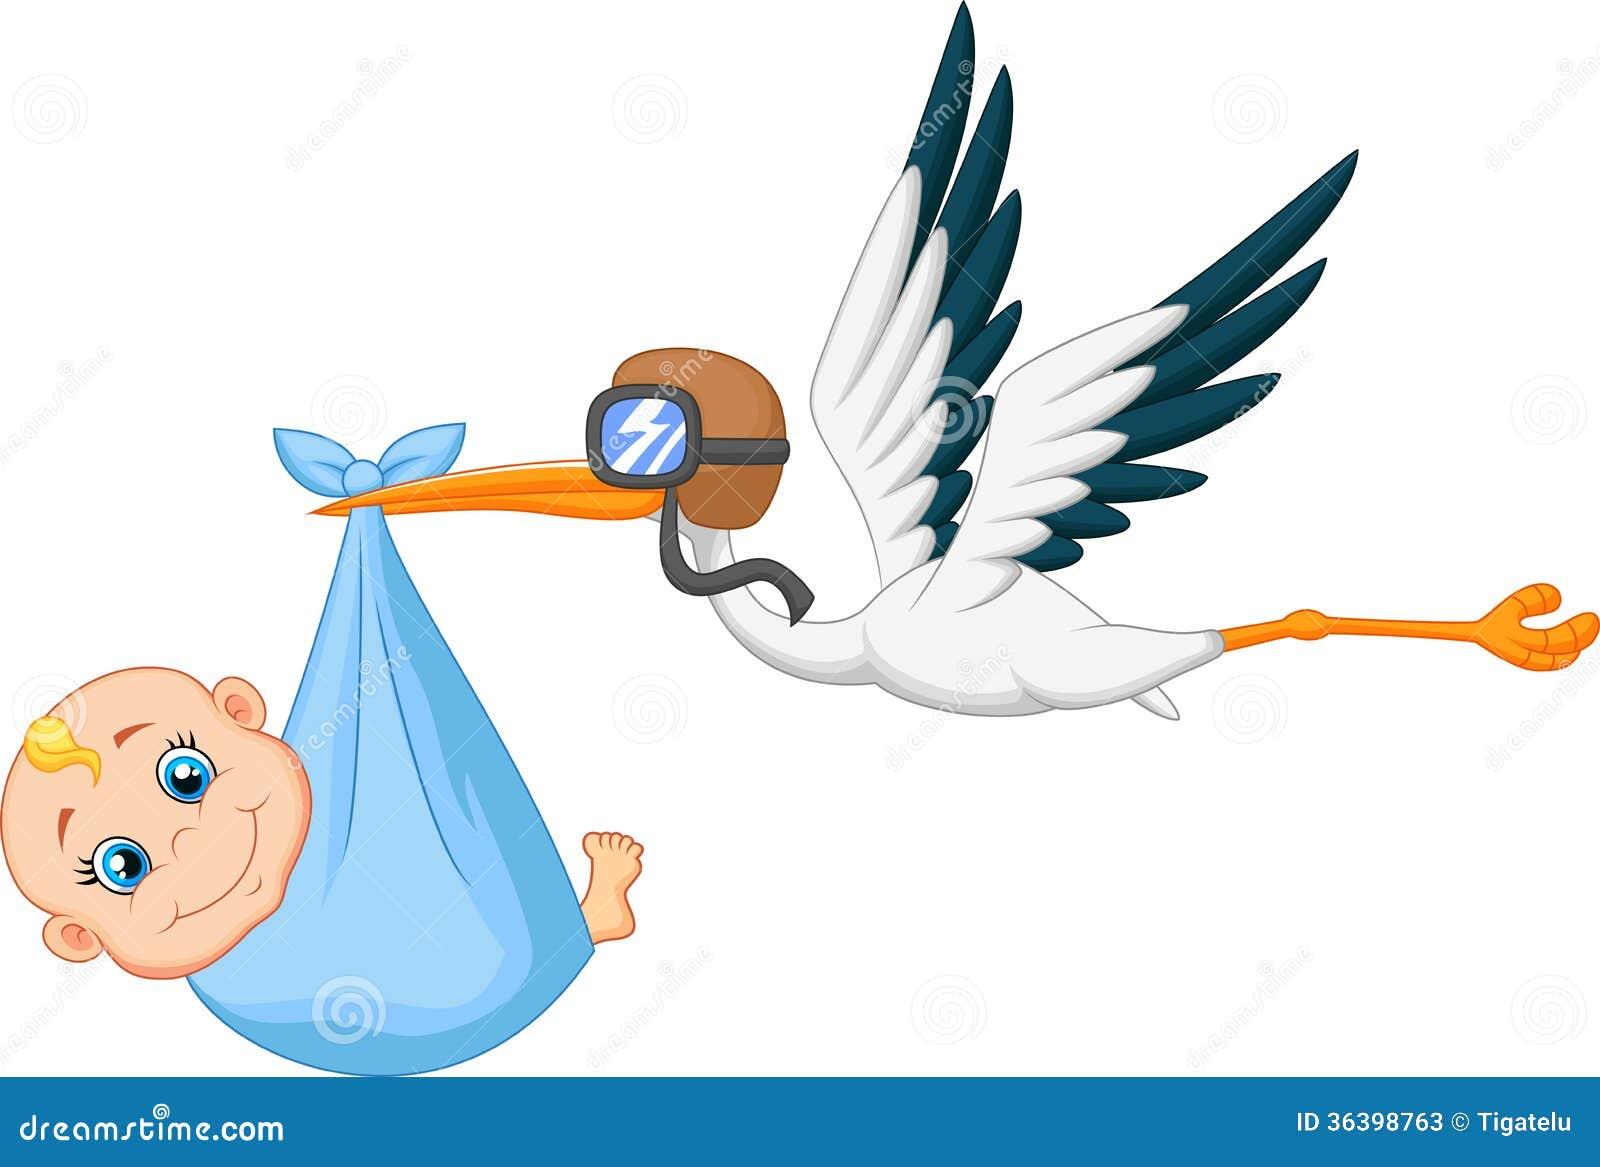 Stork And Baby Flying Cartoon Vector Illustration